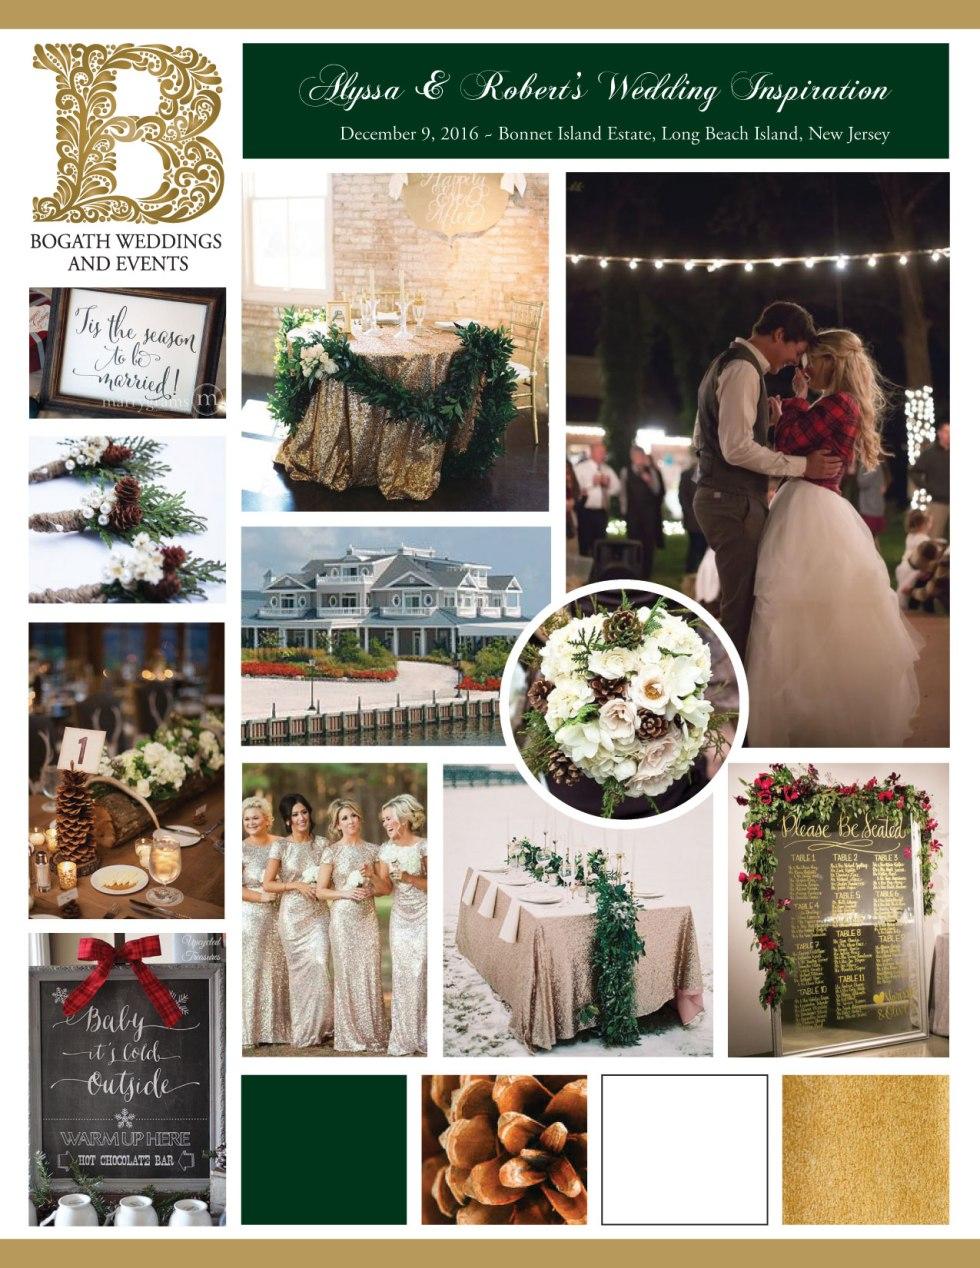 bonnet-island-estate-winter-wedding-inspiration